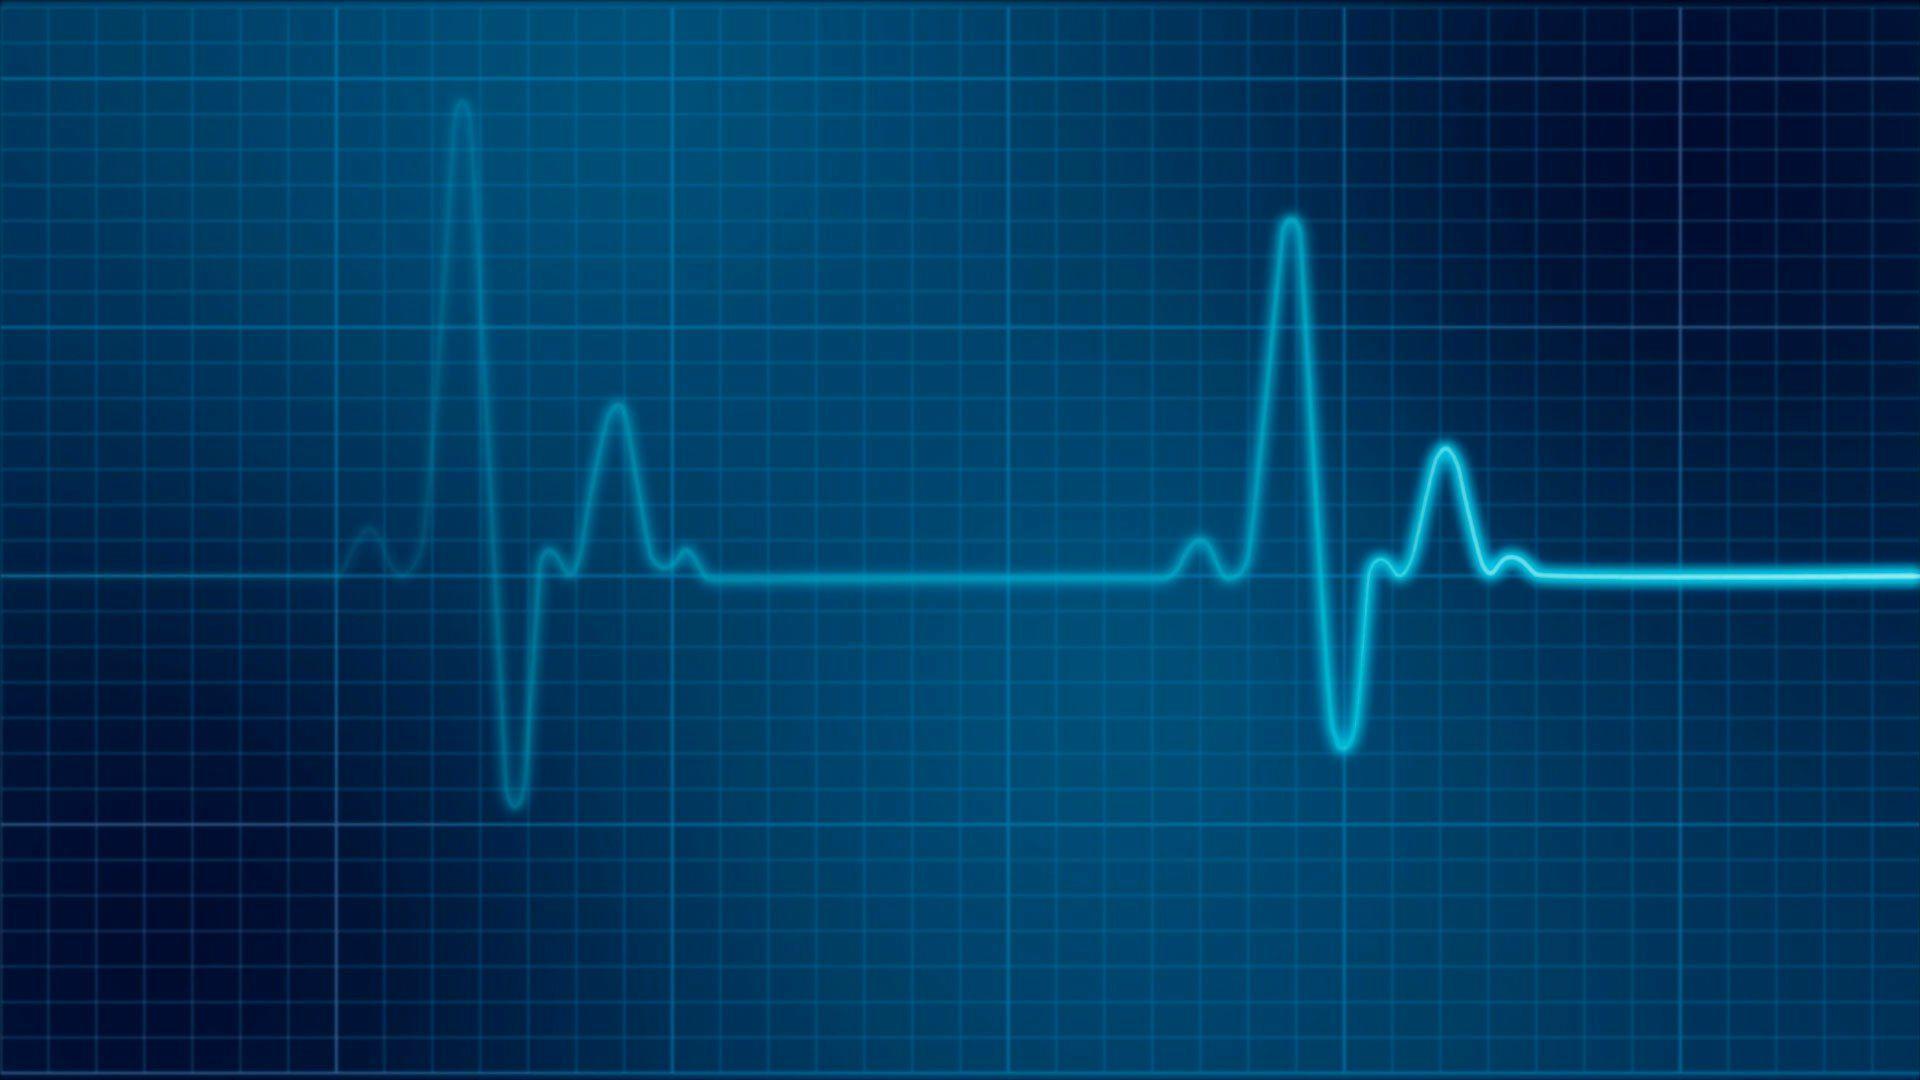 ekg-monitor-medical